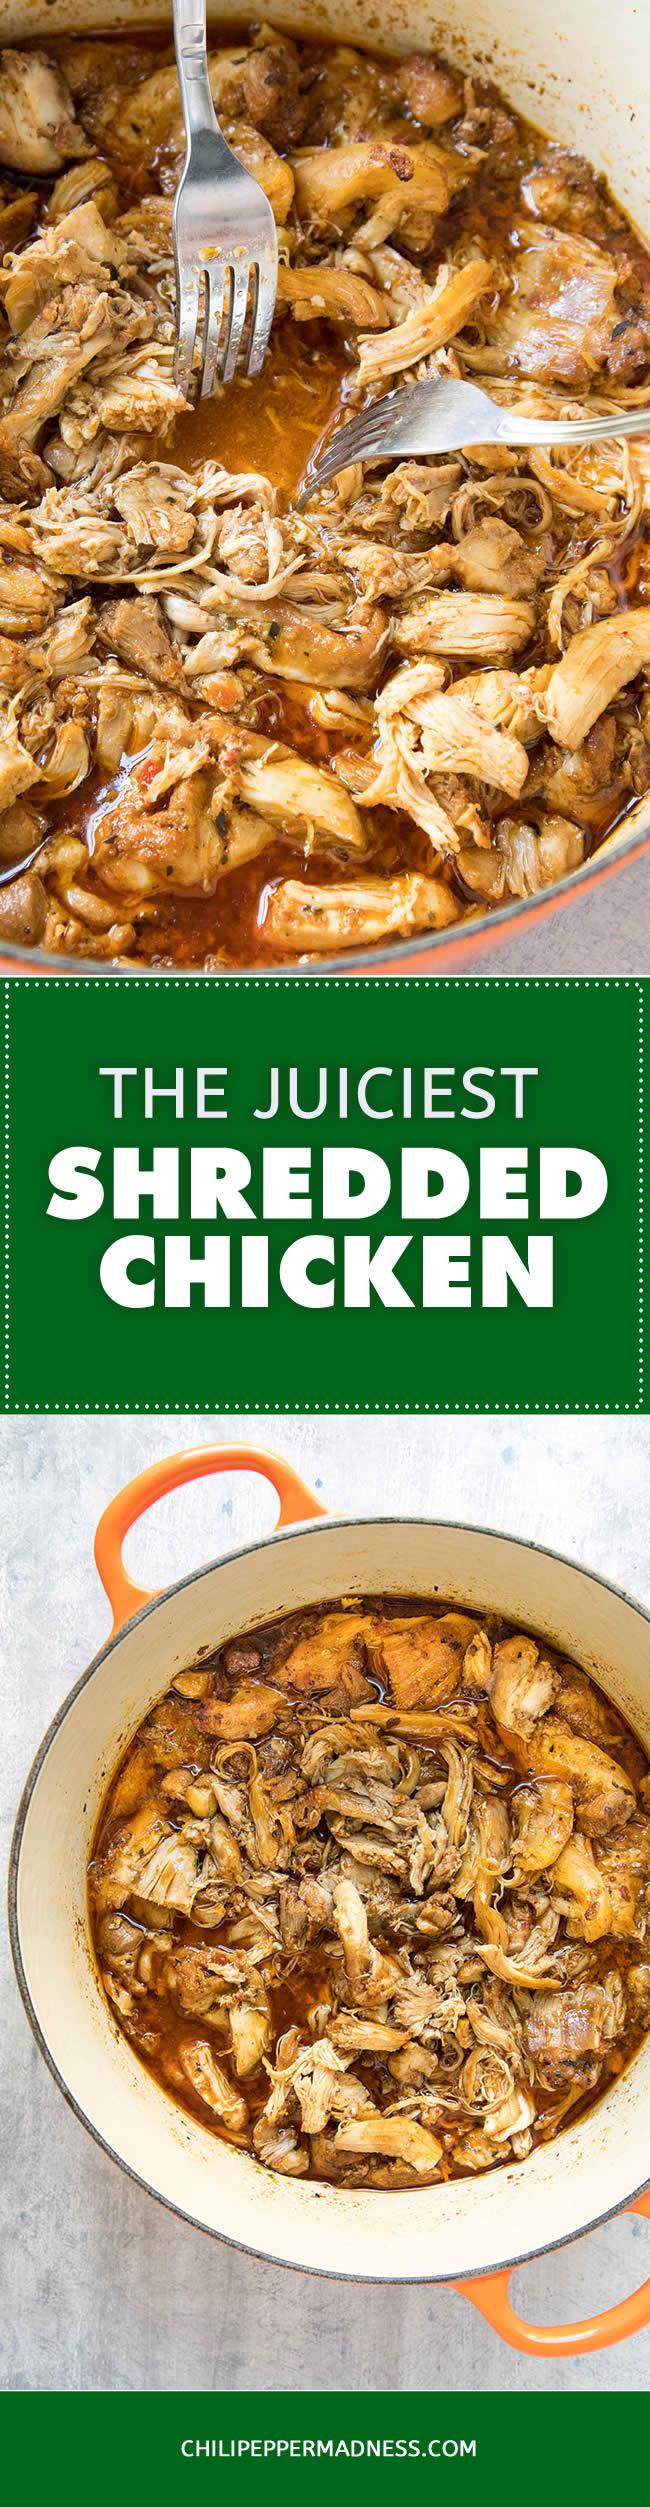 The Juiciest Shredded Chicken - Recipe